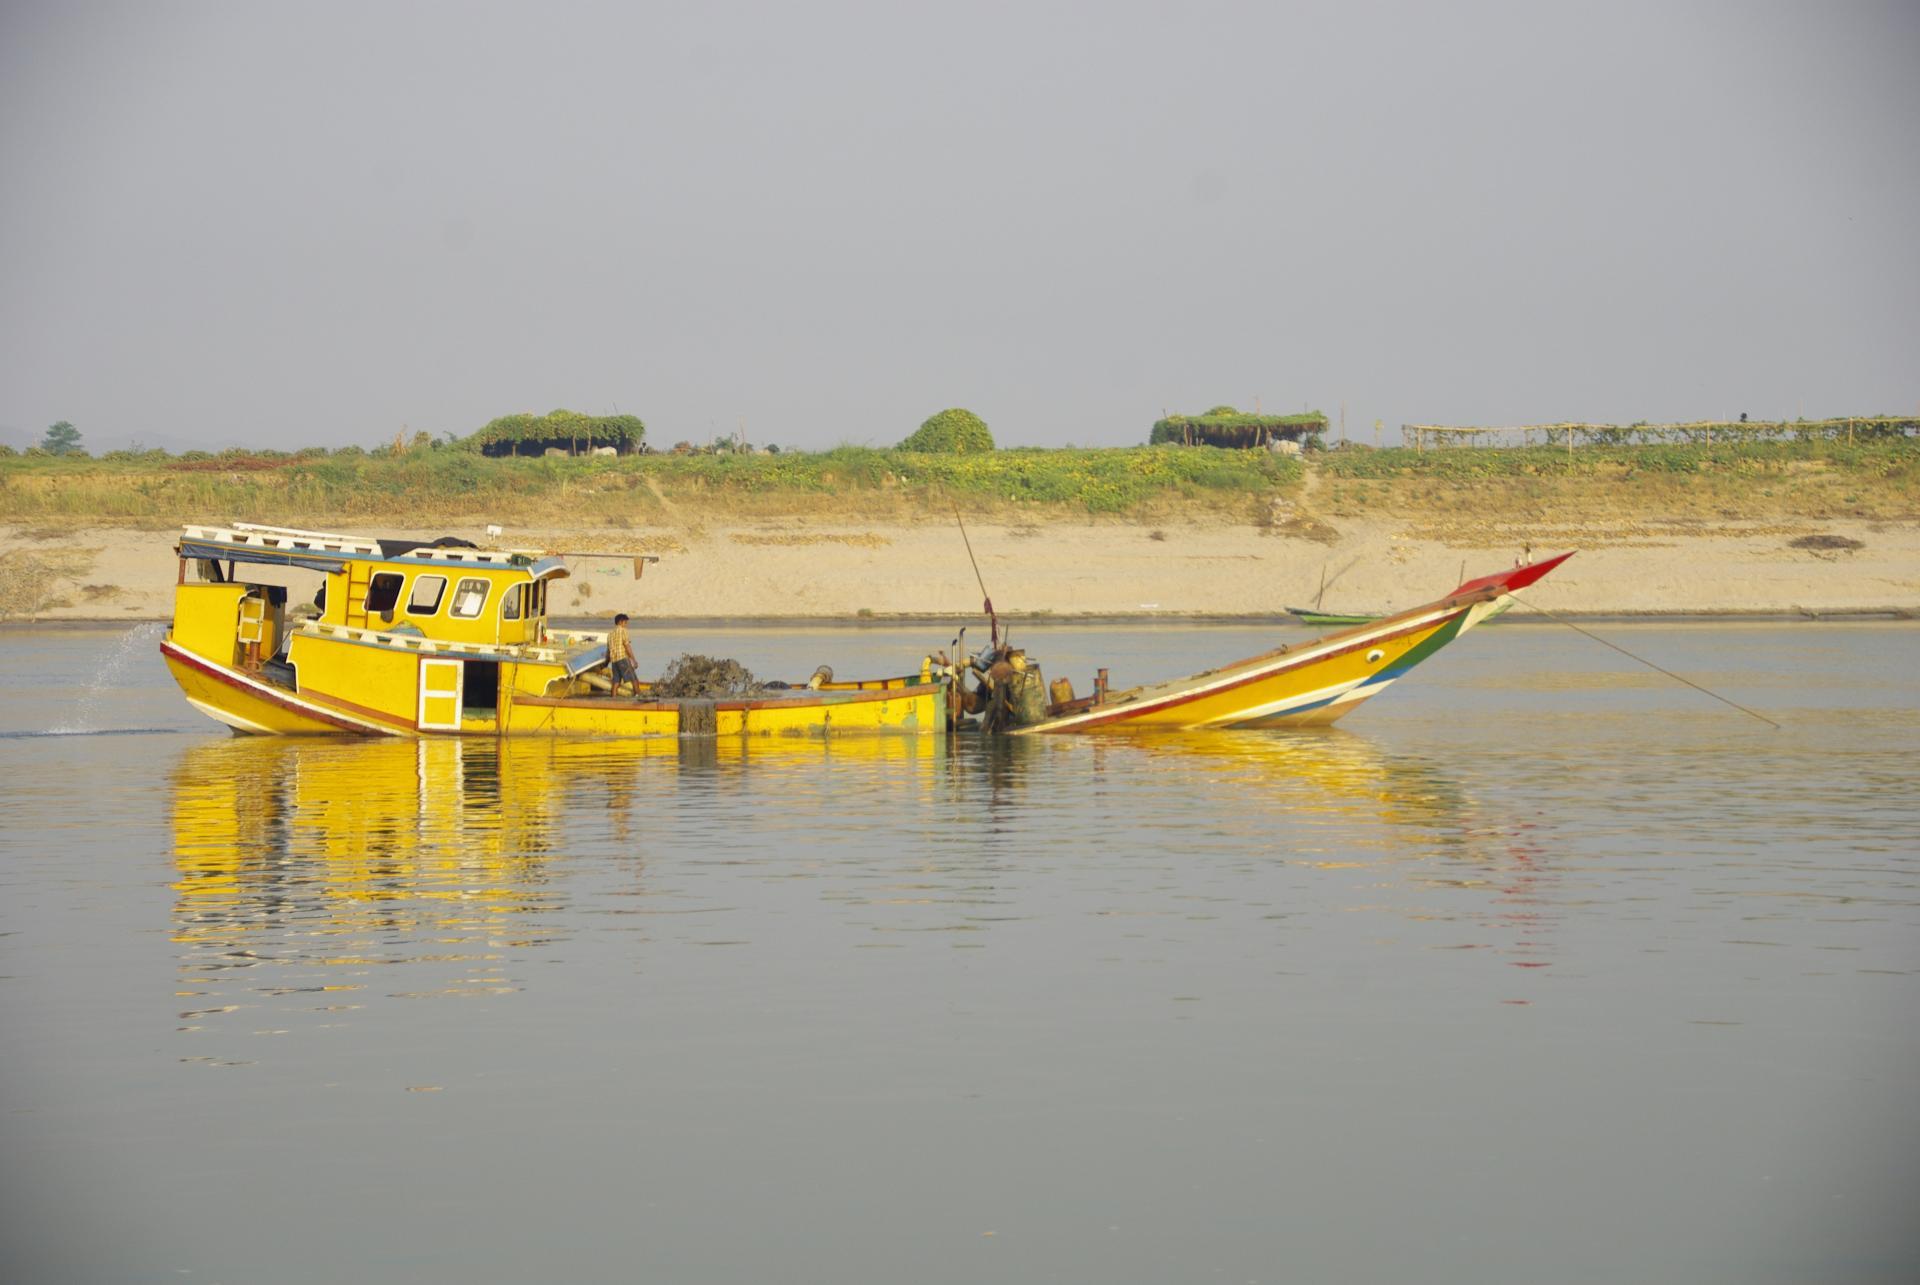 Irrawady 2